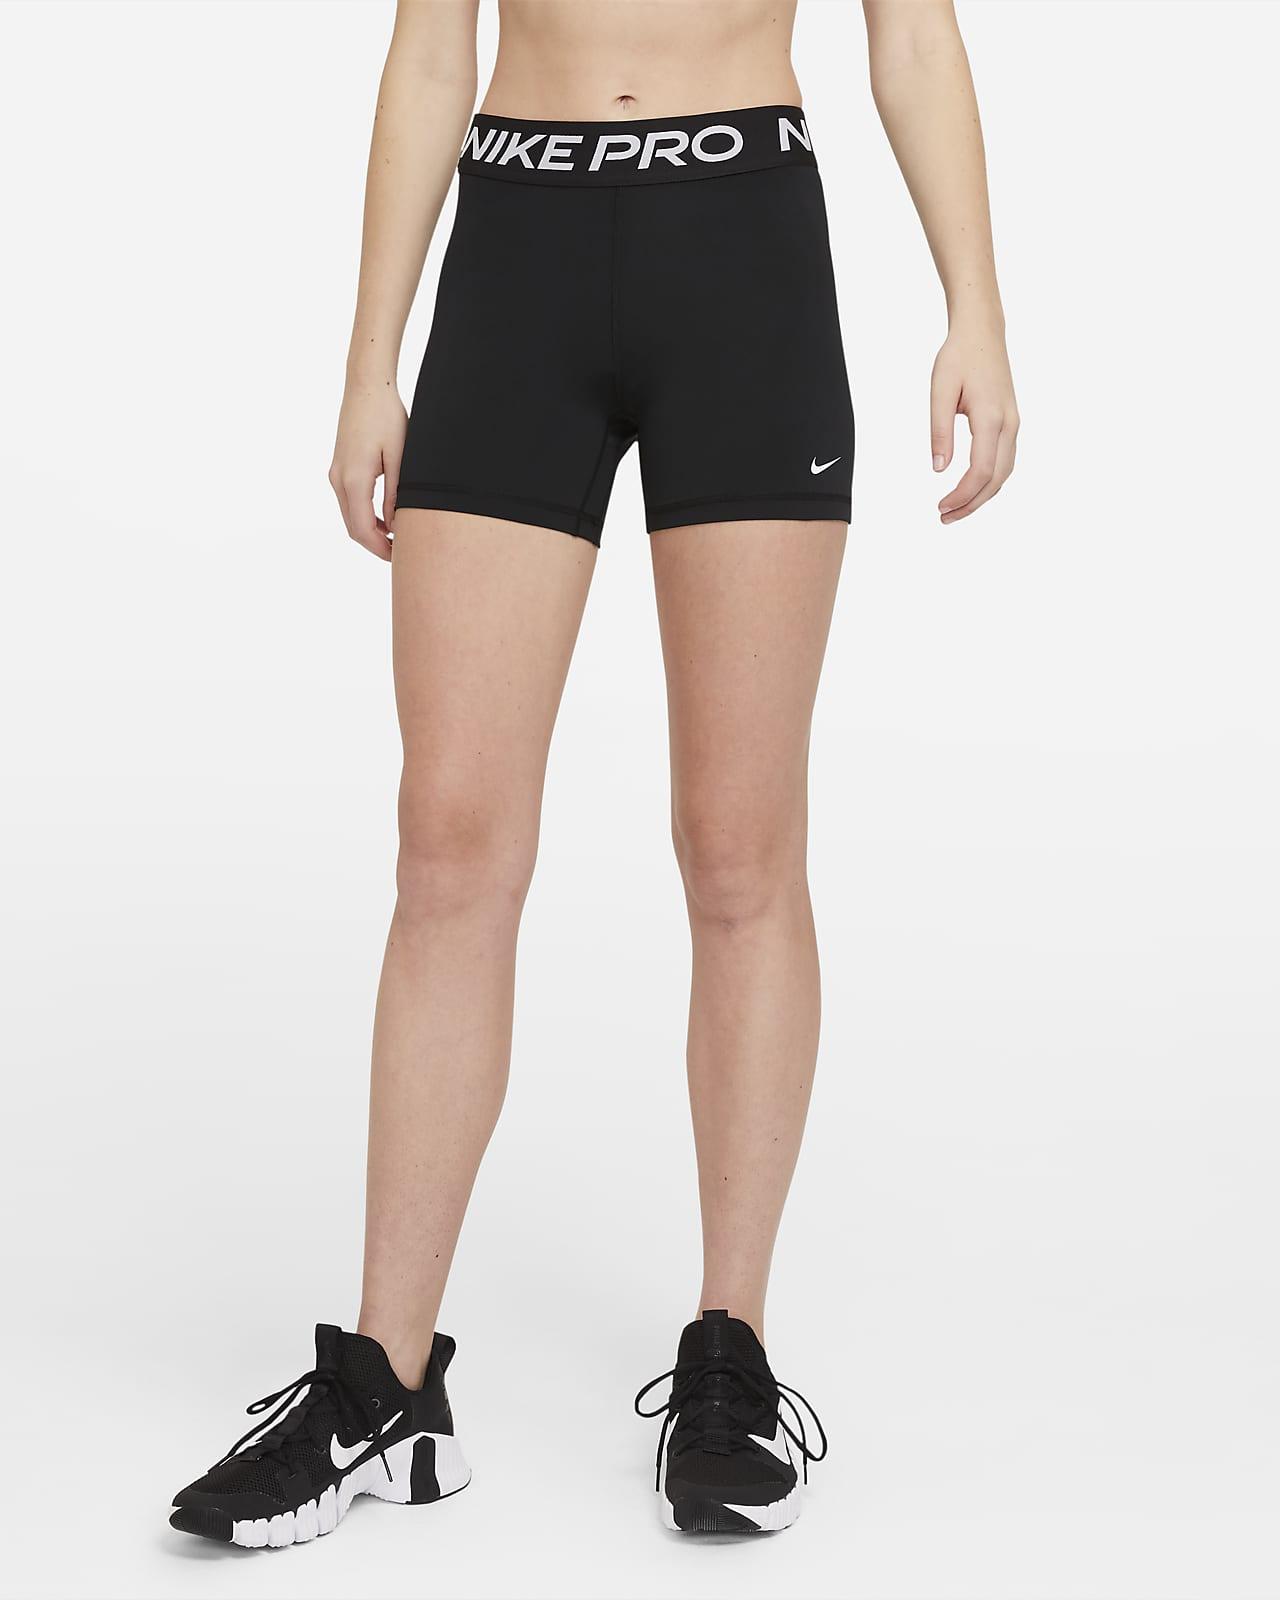 Nike Pro 365 Damenshorts (ca. 13 cm)